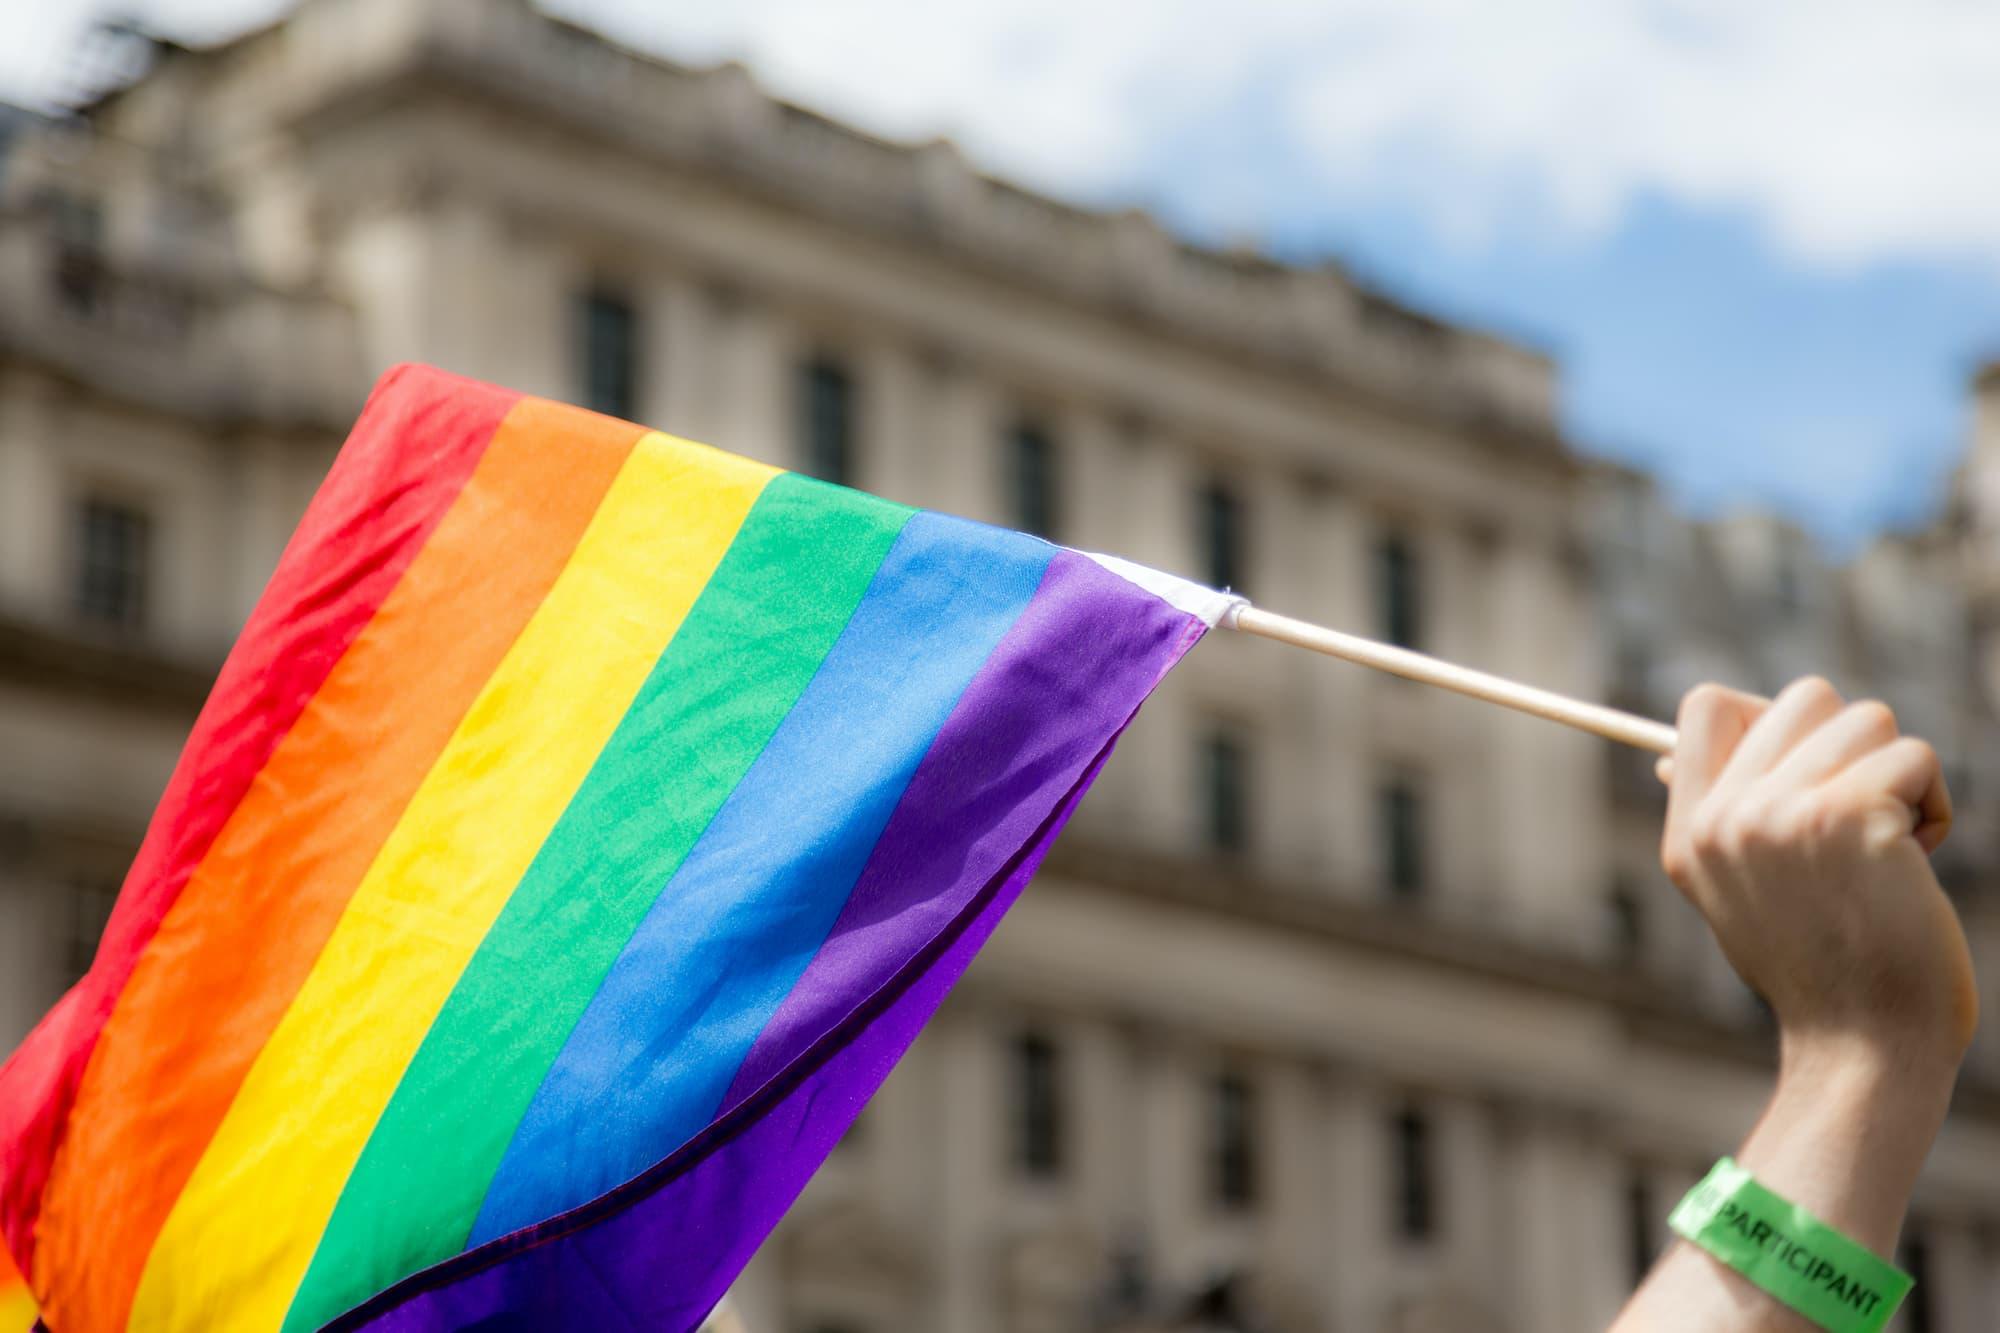 LGBTQ, states, equality, laws, discrimination